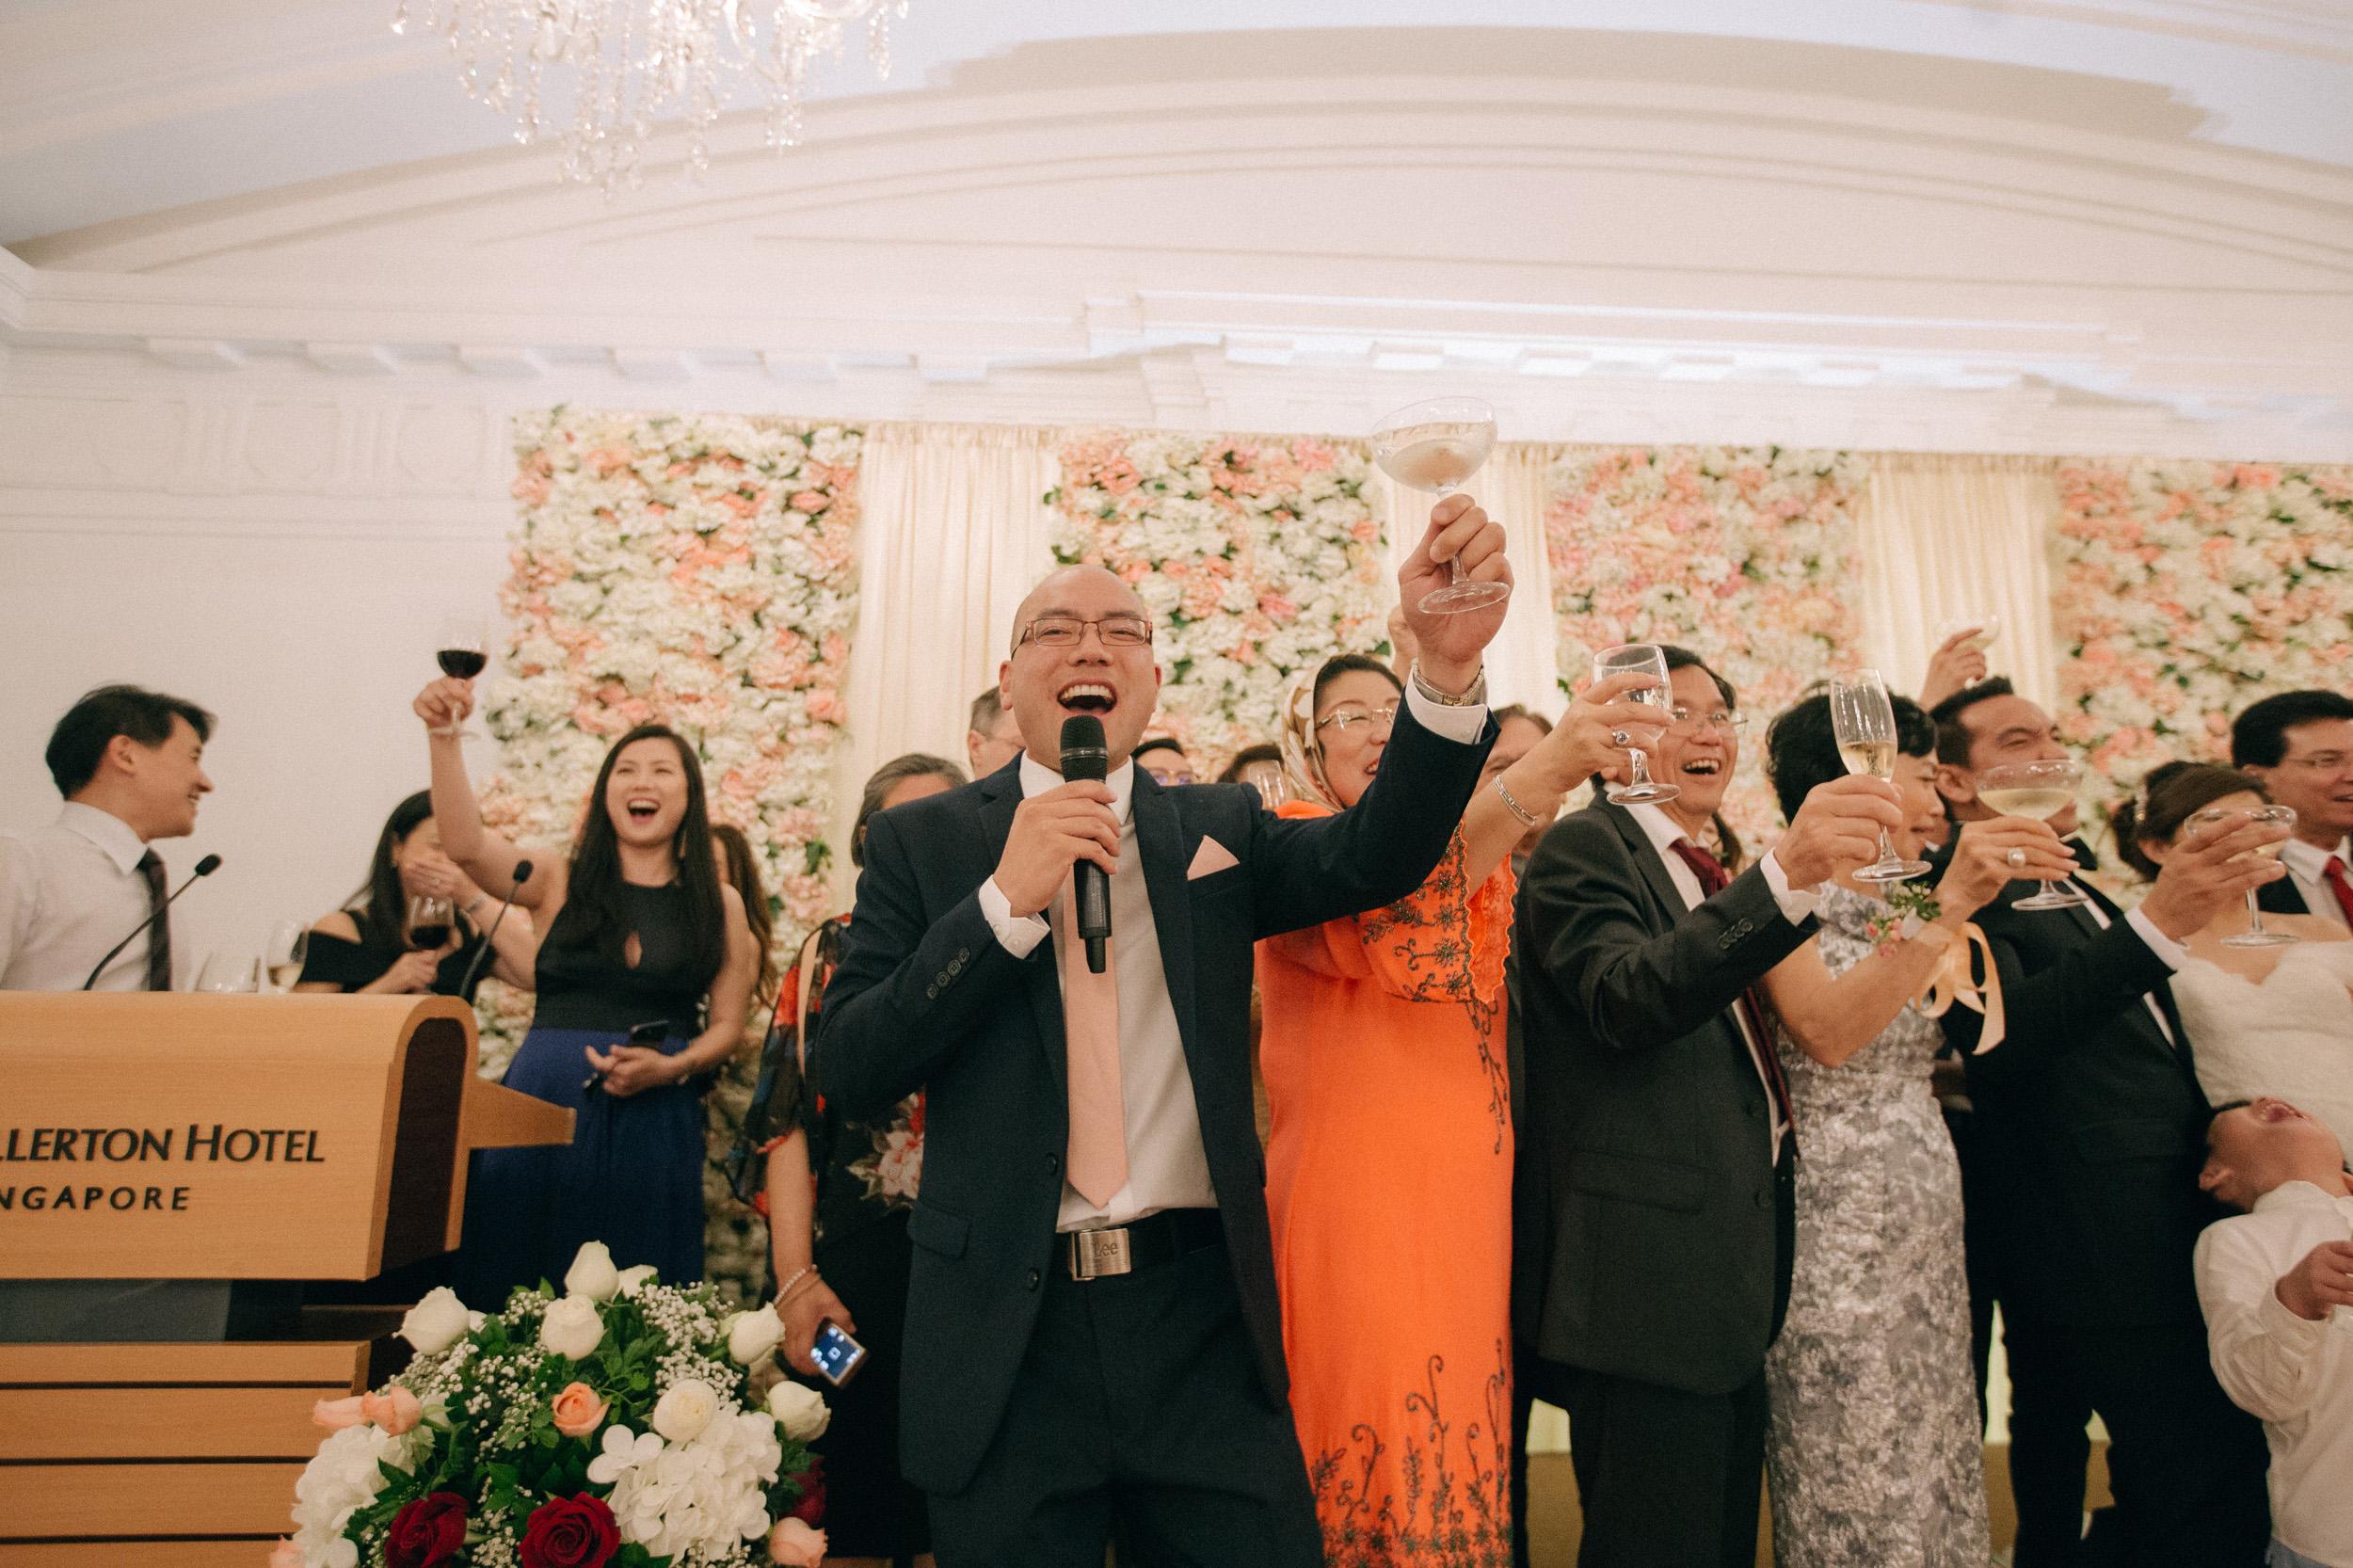 singapore-wedding-photographer-photography-wmt2017-108.jpg